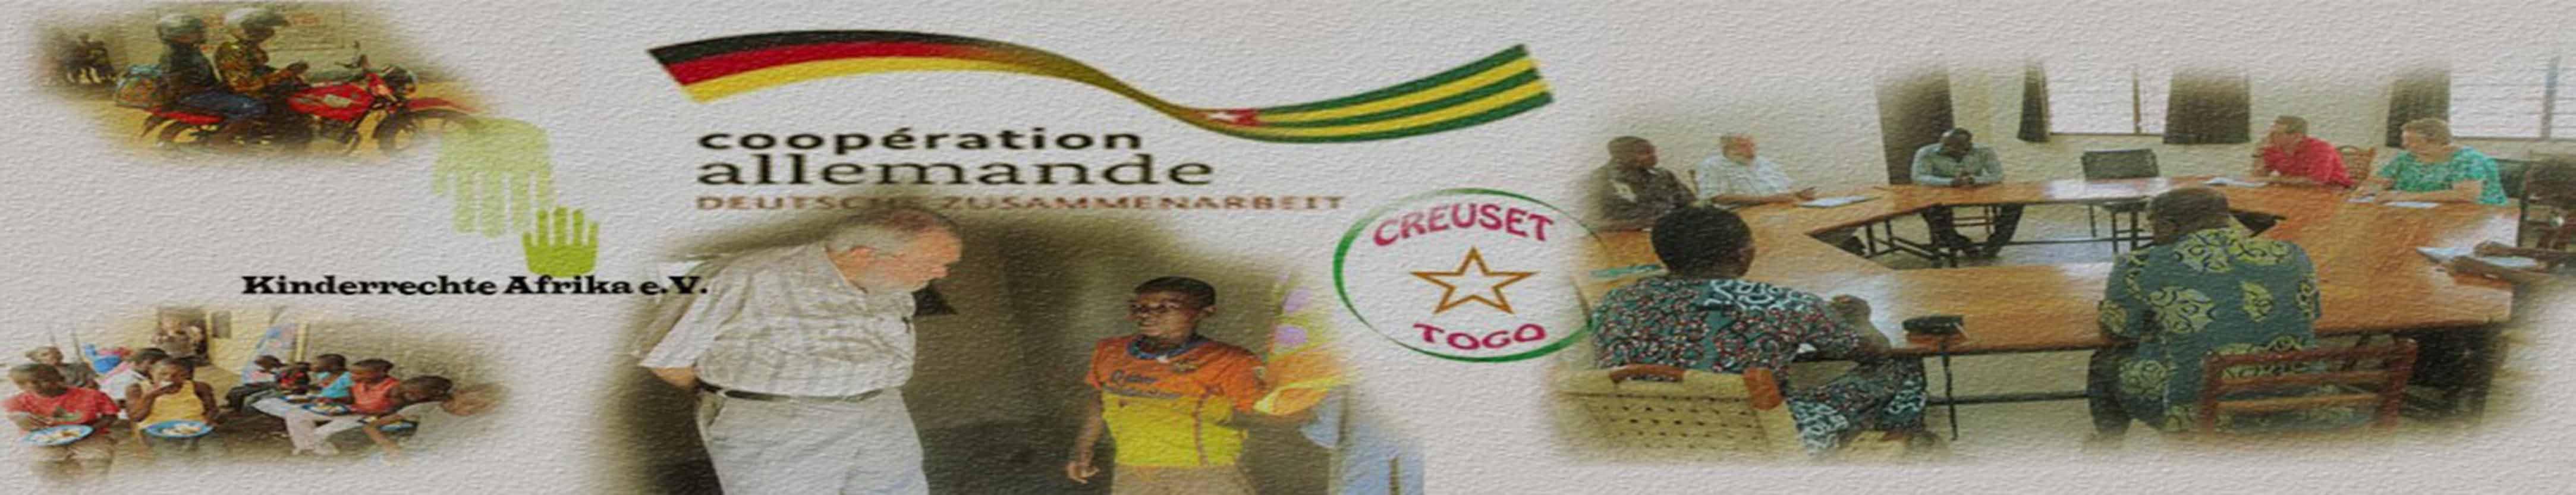 Creuset Togo